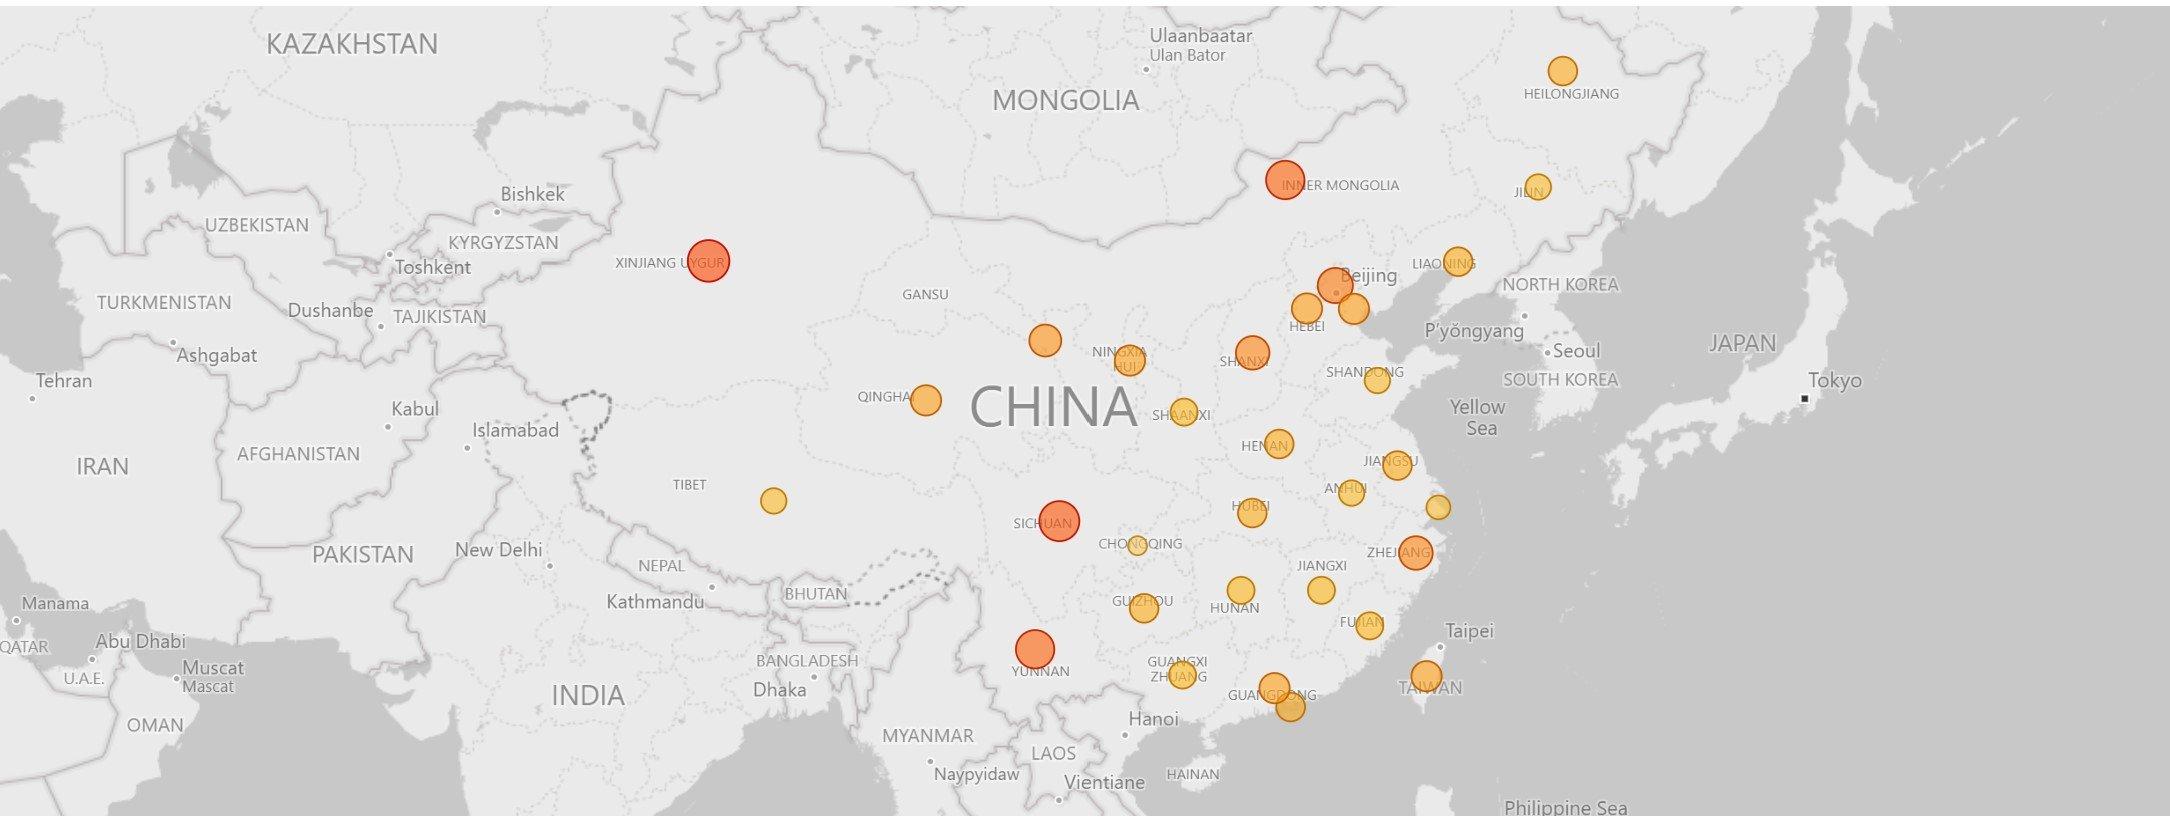 China: Bitcoin Mining Map. Source: Cambridge University.